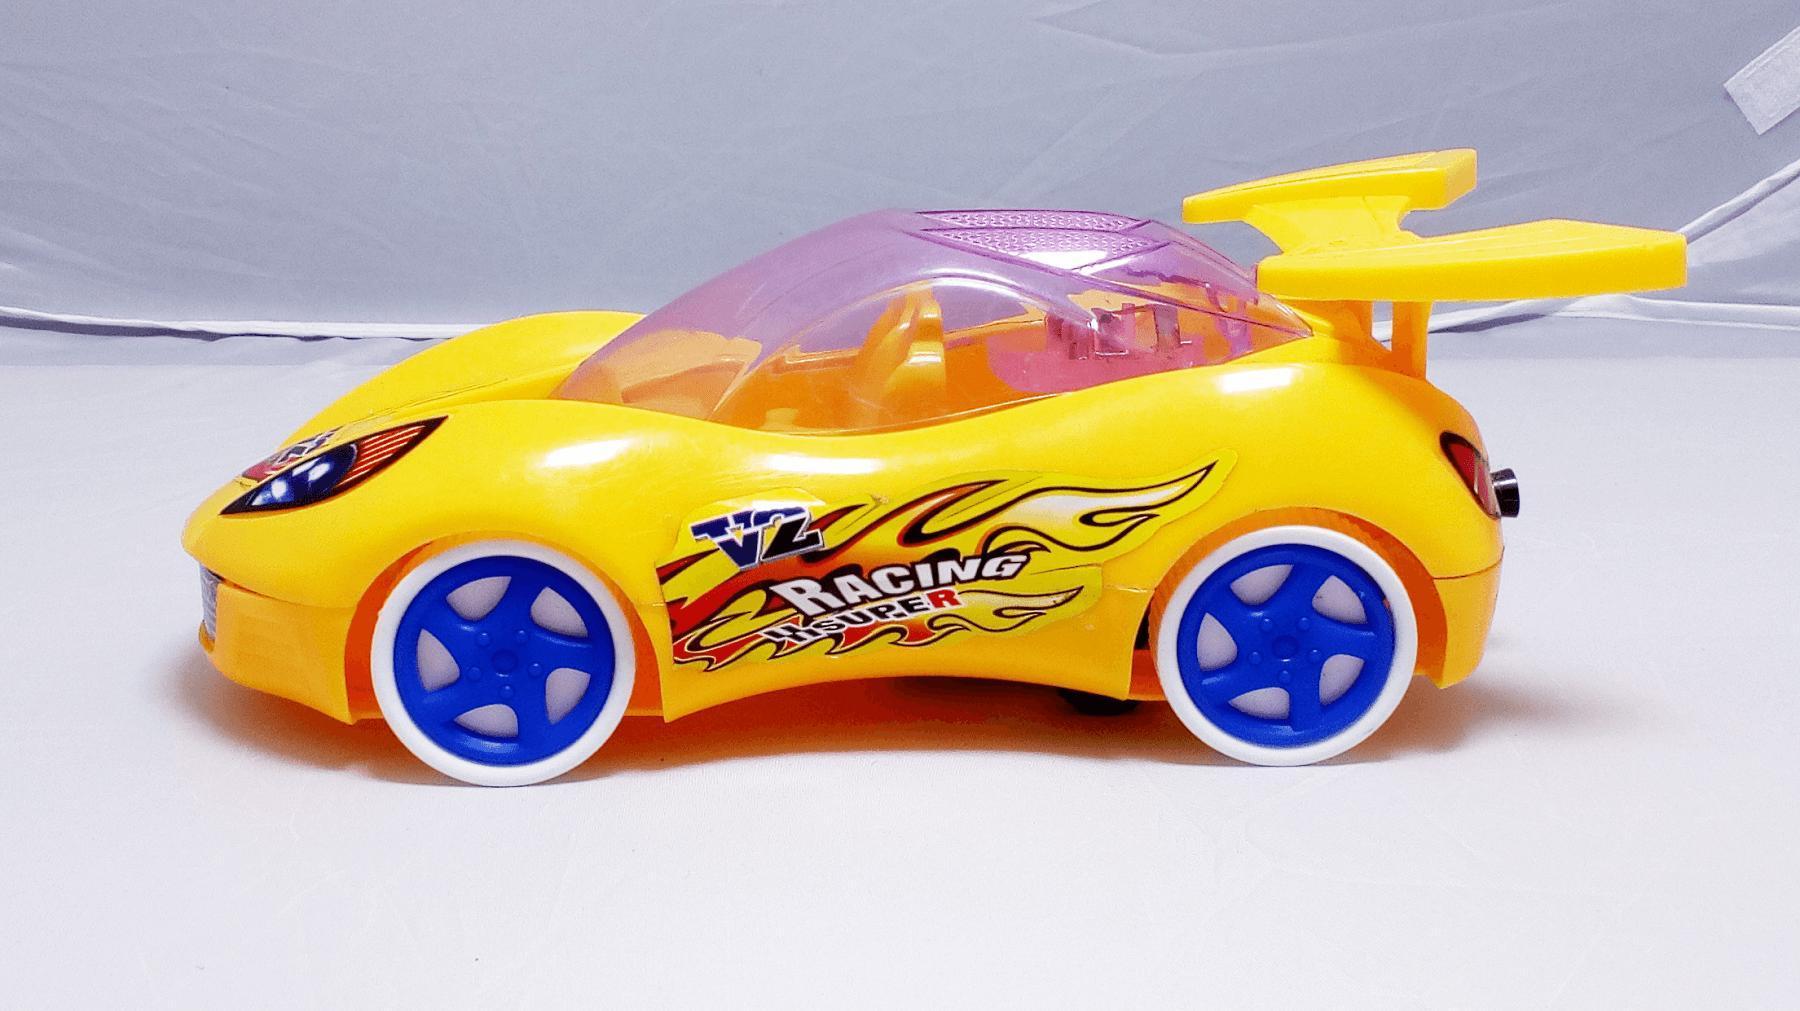 Tvcgarena Buy At Best Price In Bangladesh Daraz Garena 500000 Plastic Toy Car With Light Yellow